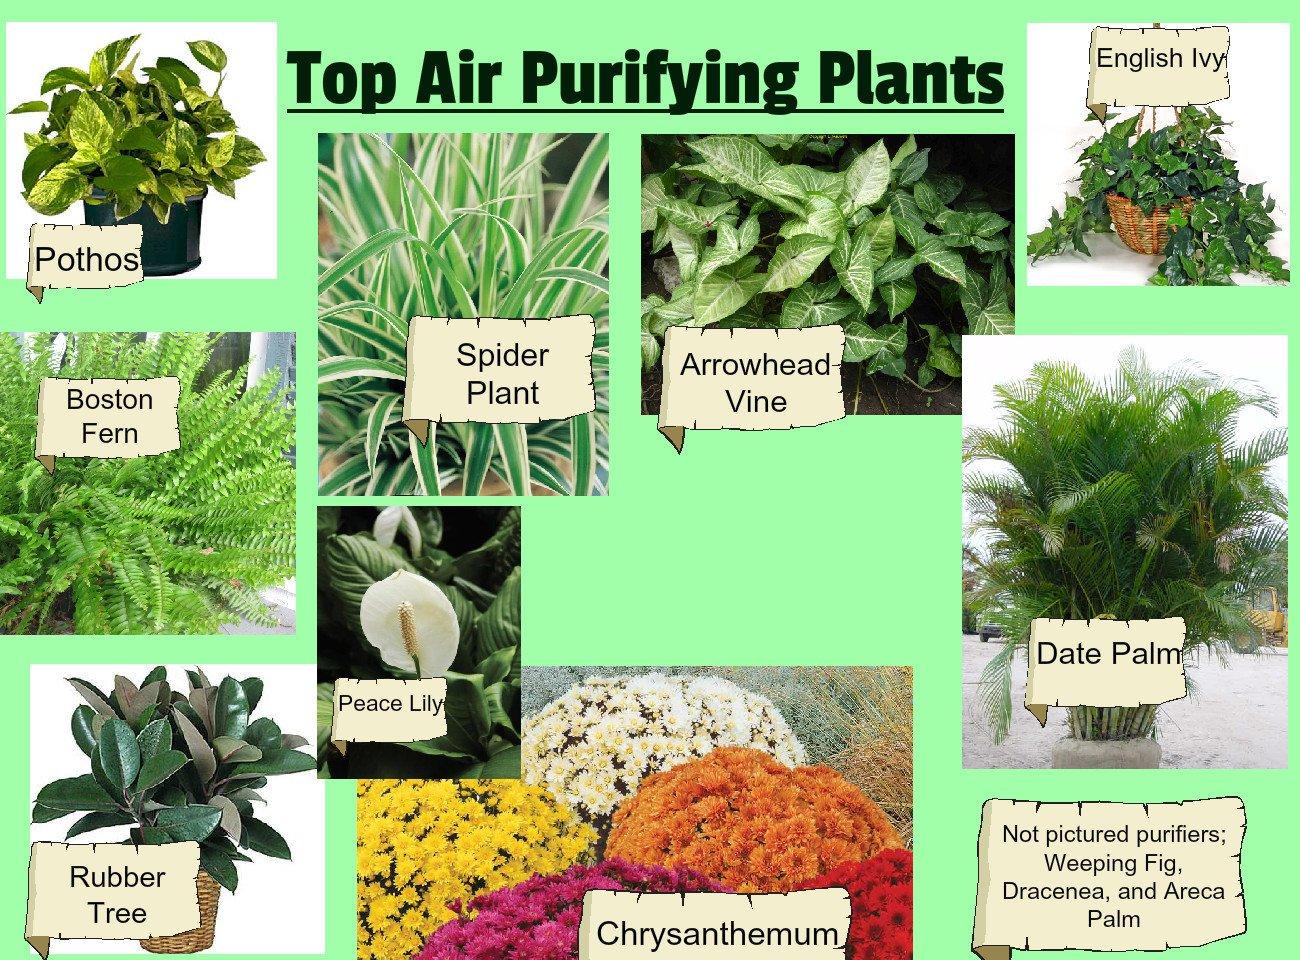 plants-to-clean-air